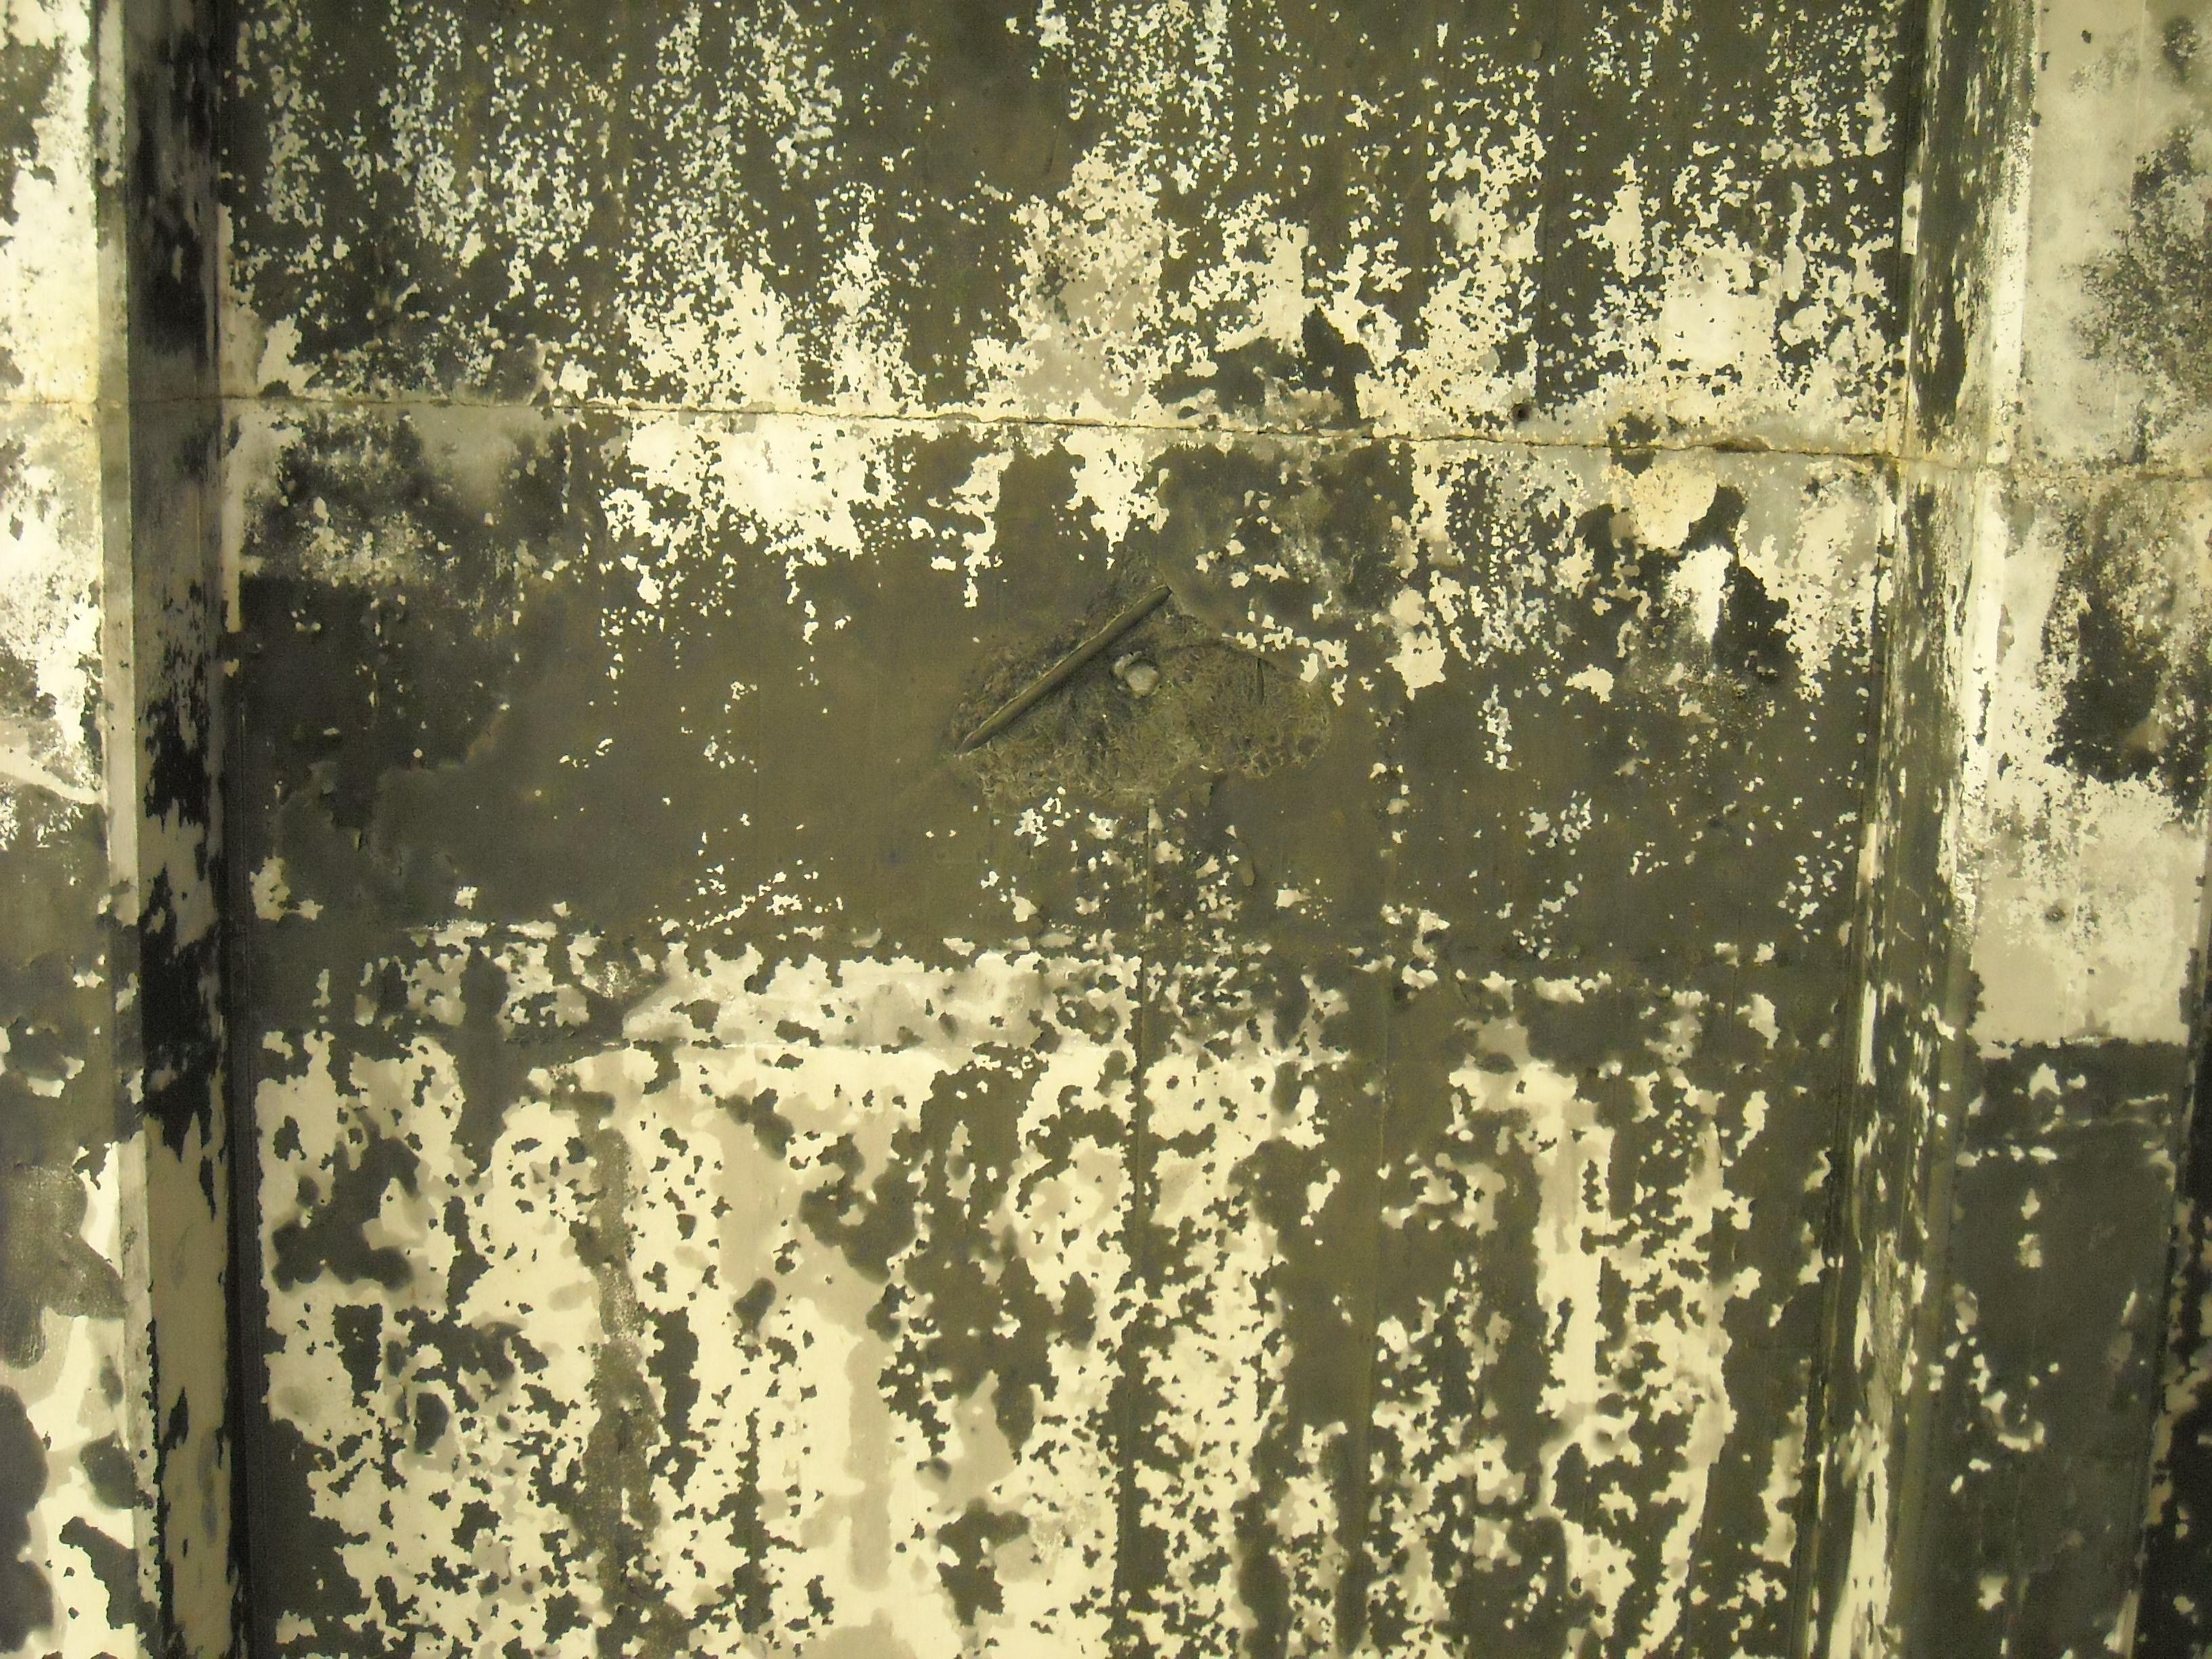 File:Grunge texture.jpg - Wikimedia Commons